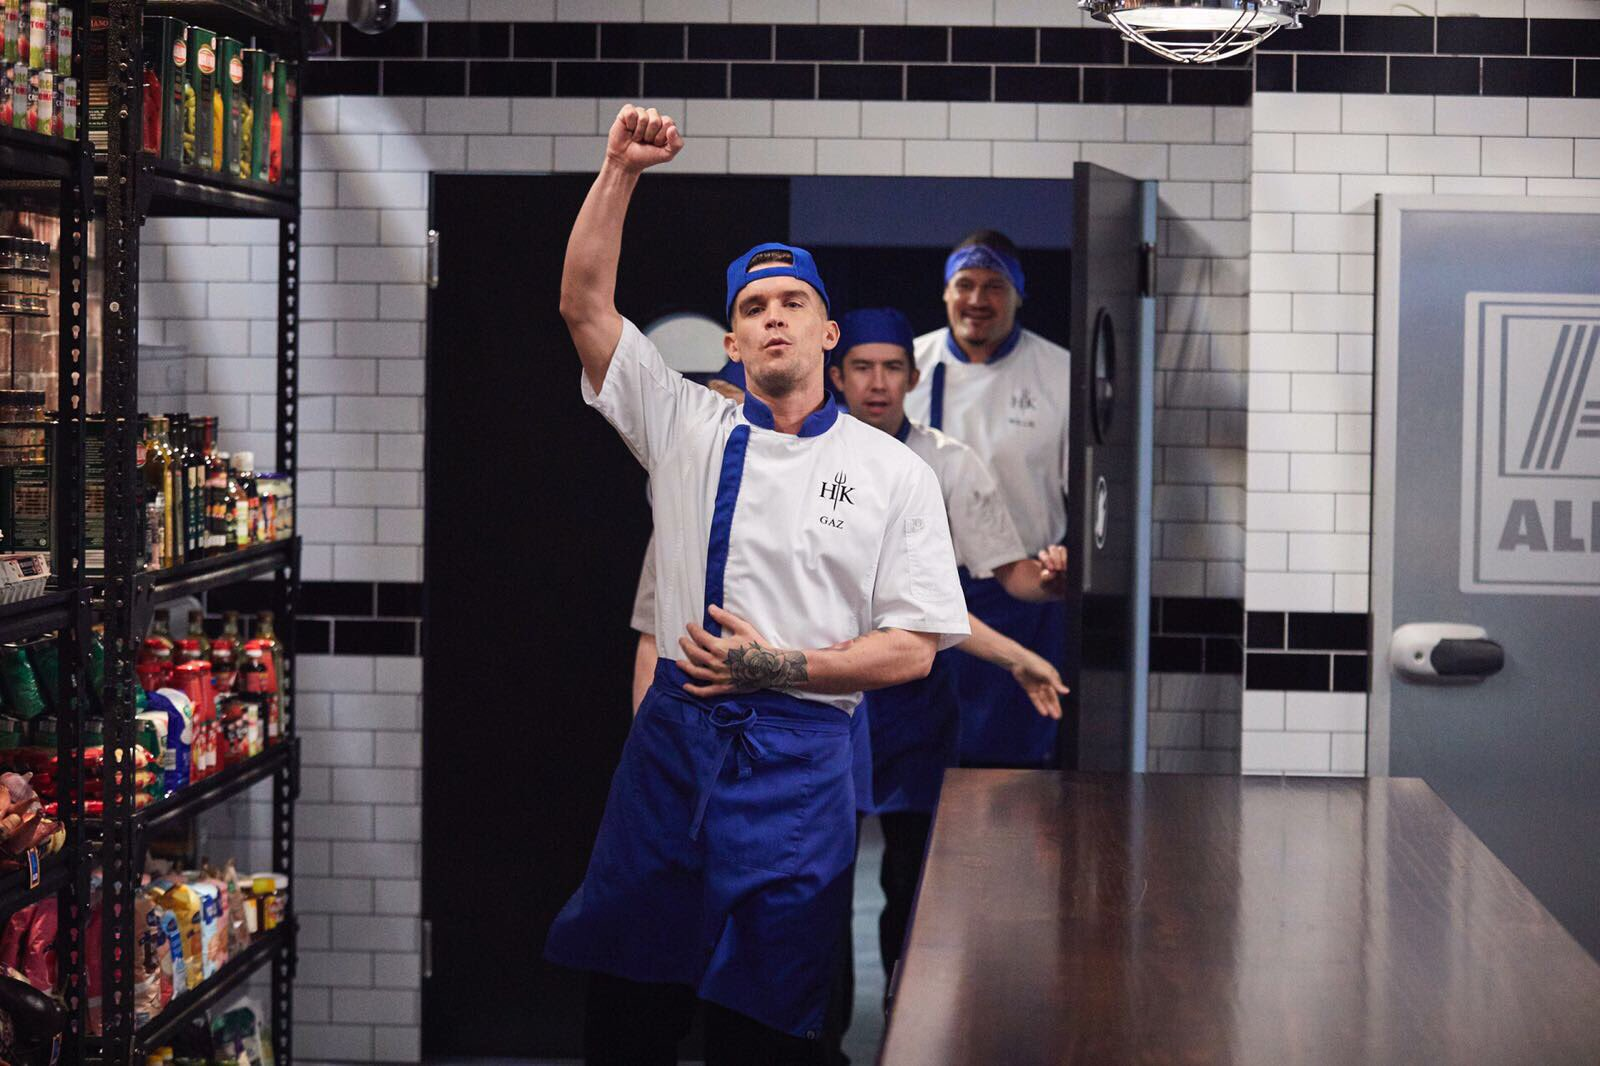 Walking into the kitchen like.... 🙋🏻♂️ team blue 💙🔥🍽 AUSTRALIA don't miss it tonight @Channel7 8PM #HellsKitchen https://t.co/EUcv6wJa58